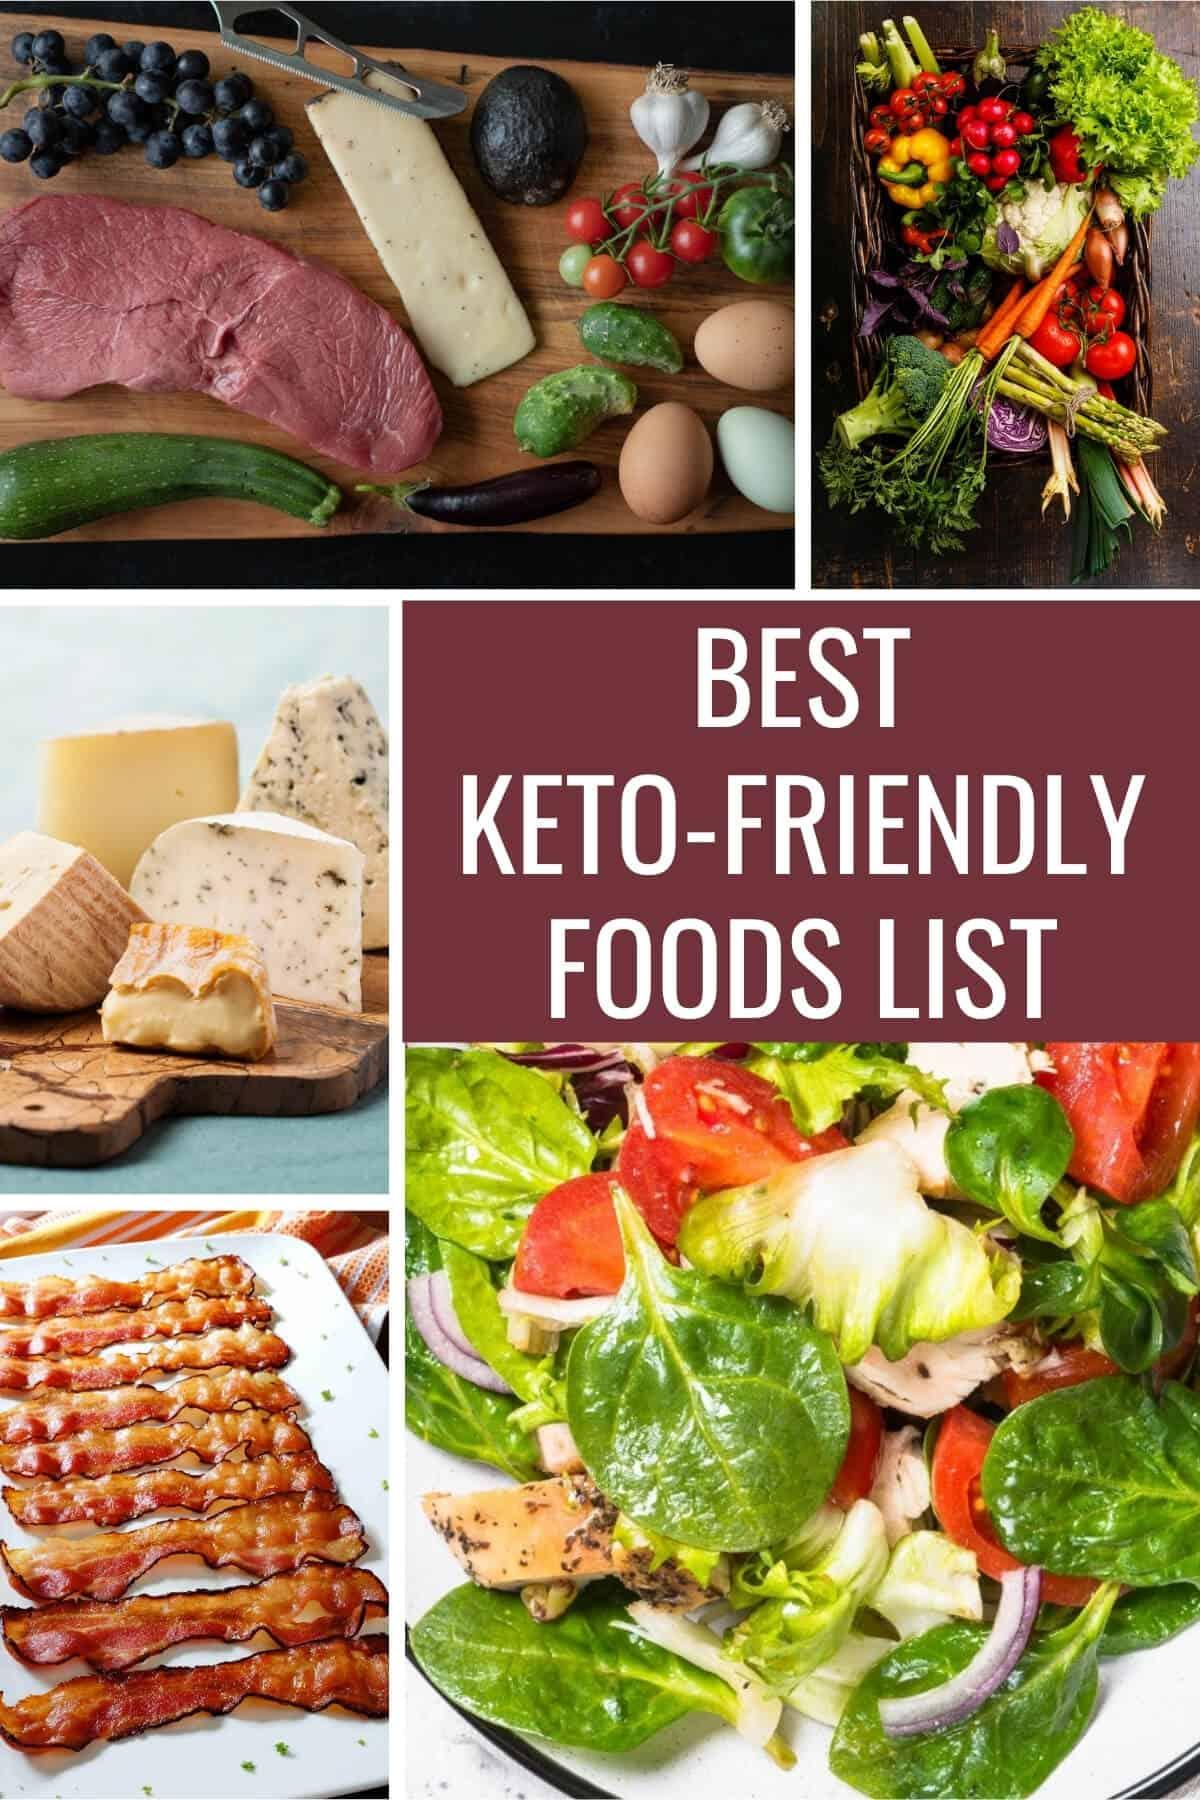 best keto friendly foods list pinterest image